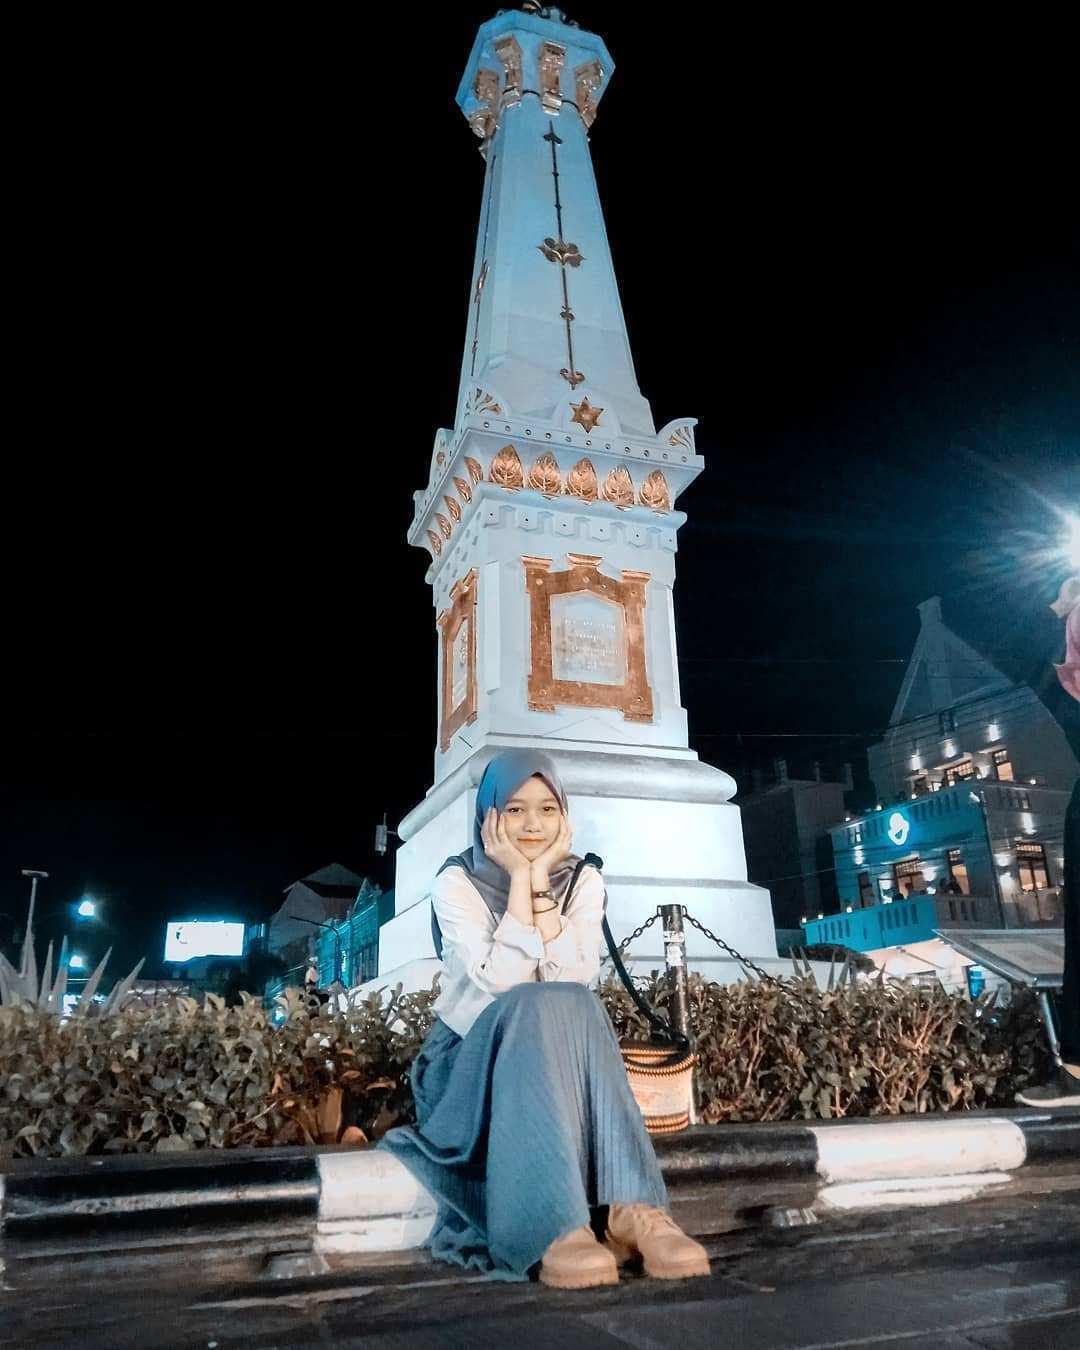 Berfoto Di Tugu Jogja, Image From @nadhea_npa